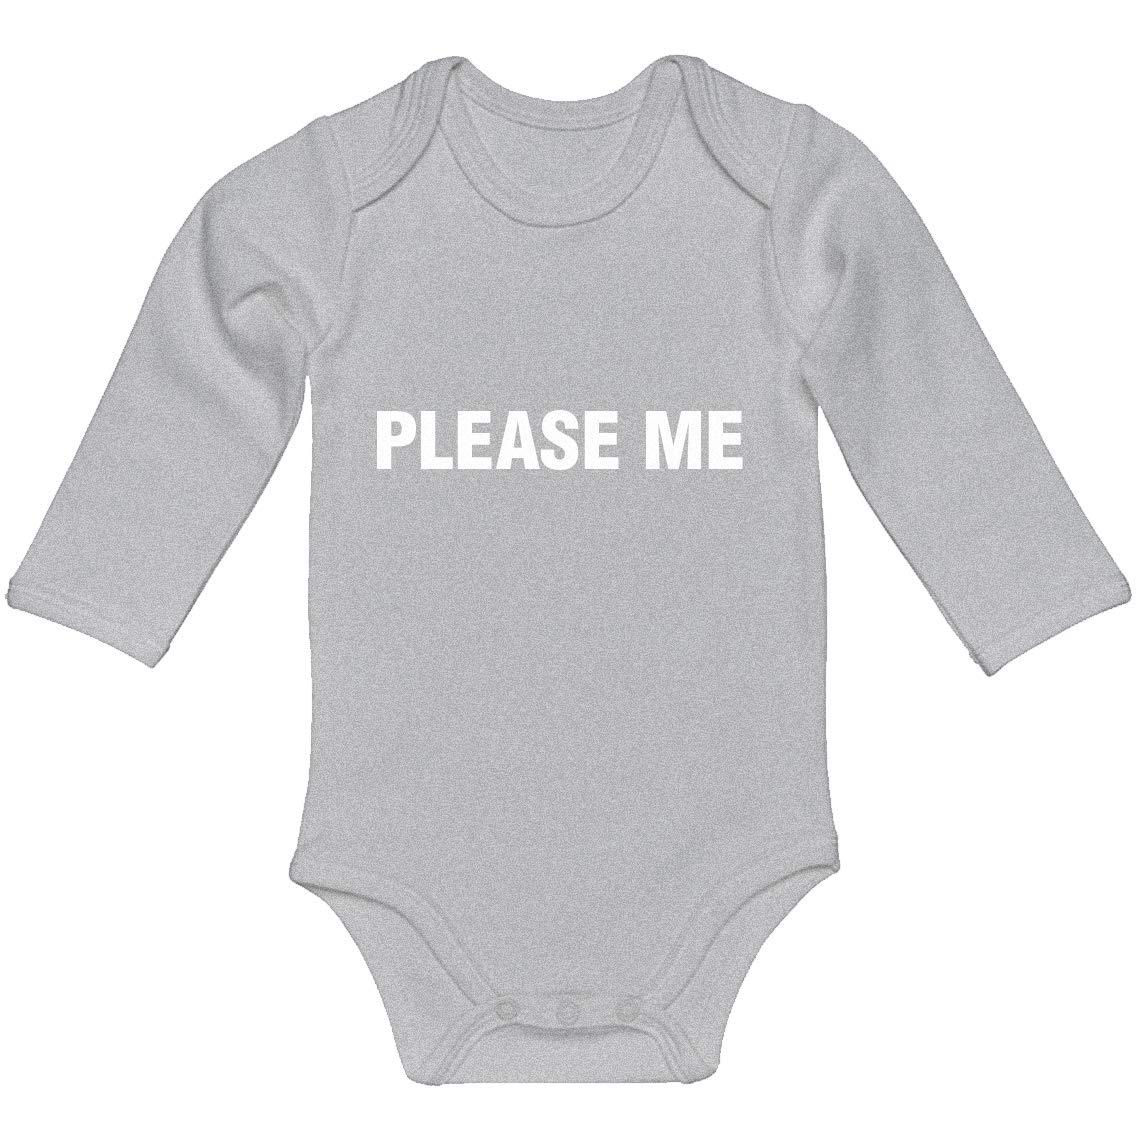 100/% Cotton Long Sleeve Infant Bodysuit Indica Plateau Baby Romper Please Me